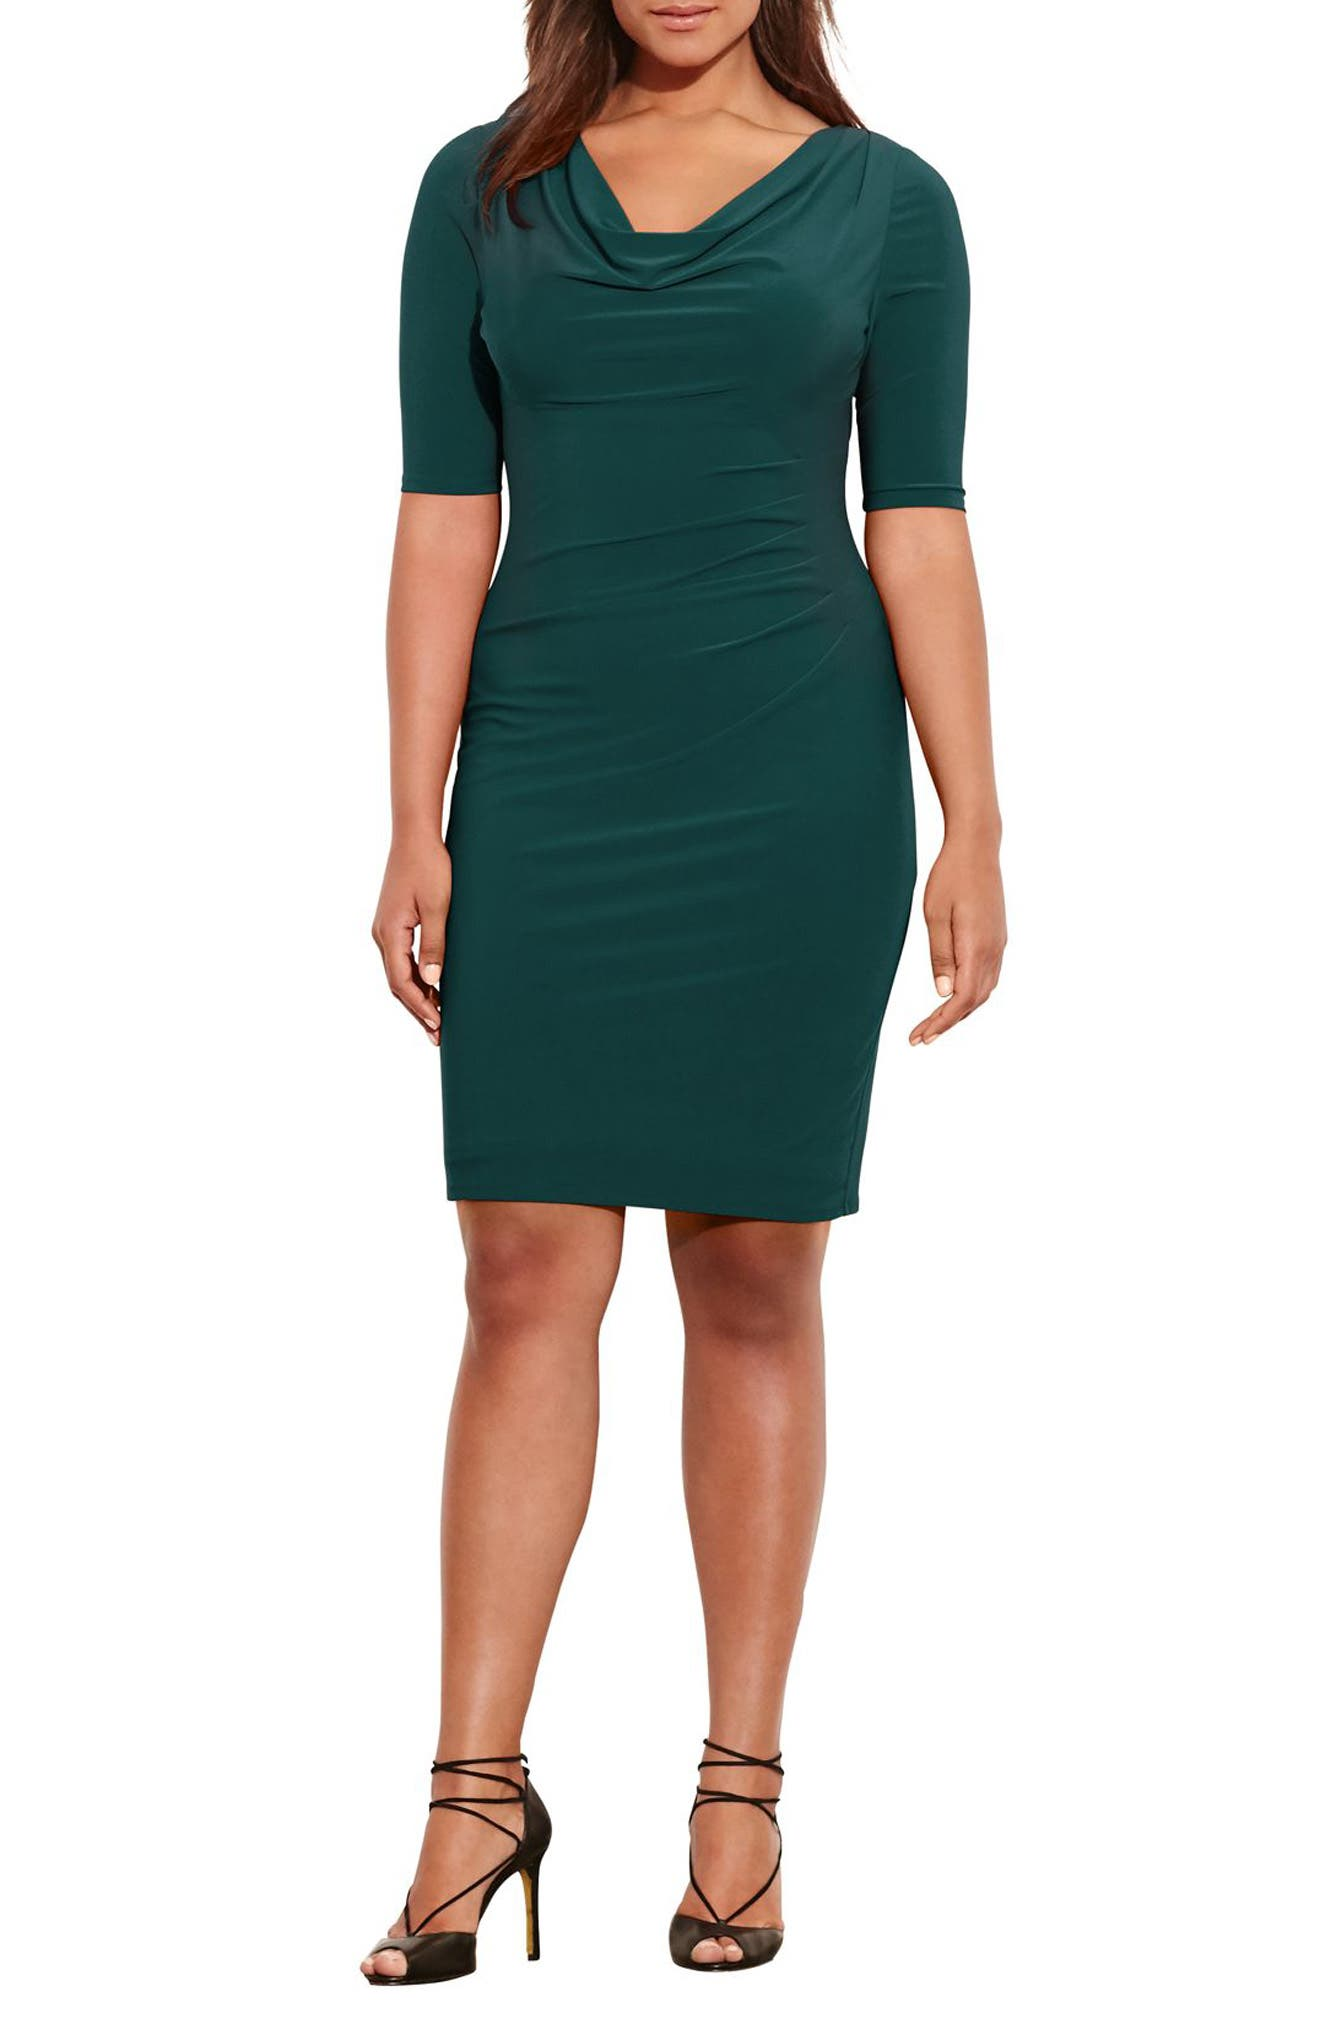 Lauren Ralph Lauren Carleton Cowl Neck Jersey Dress (Plus Size)